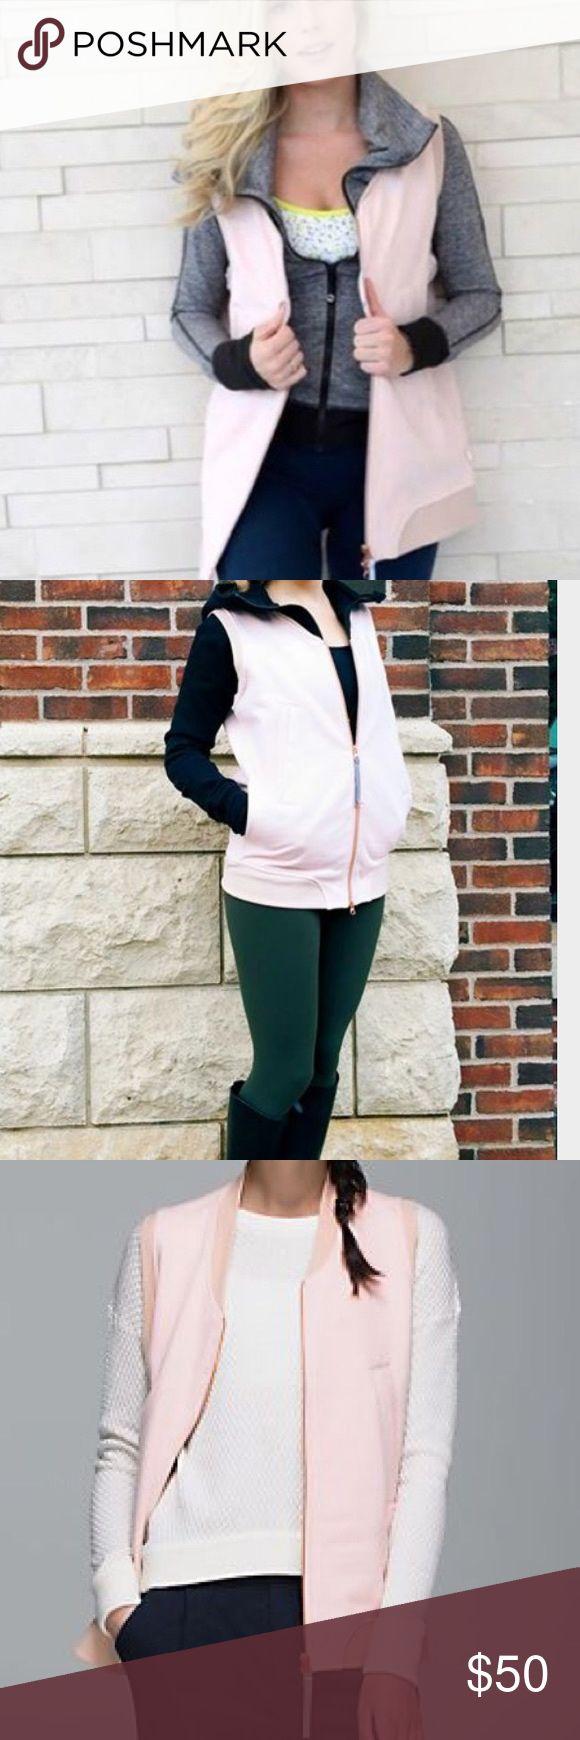 Lululemon vest Worn once! Excellent condition lululemon athletica Jackets & Coats Vests